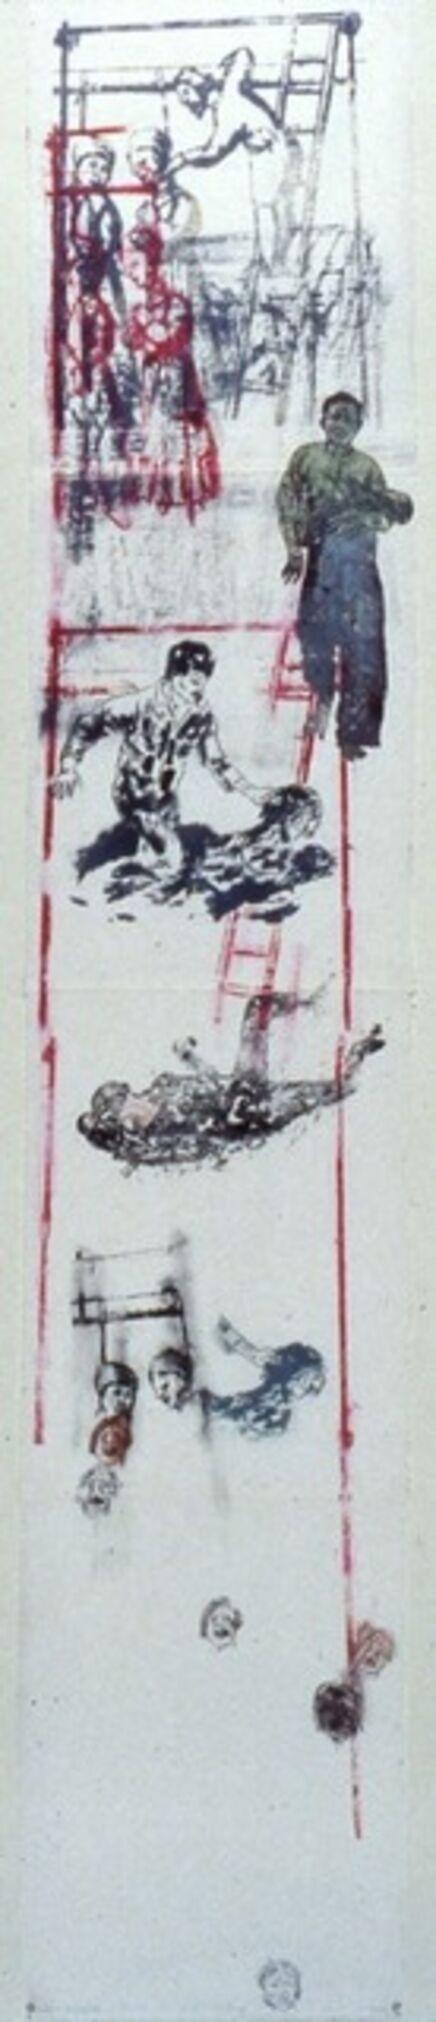 Nancy Spero, 'Hanging Totem II', 1986